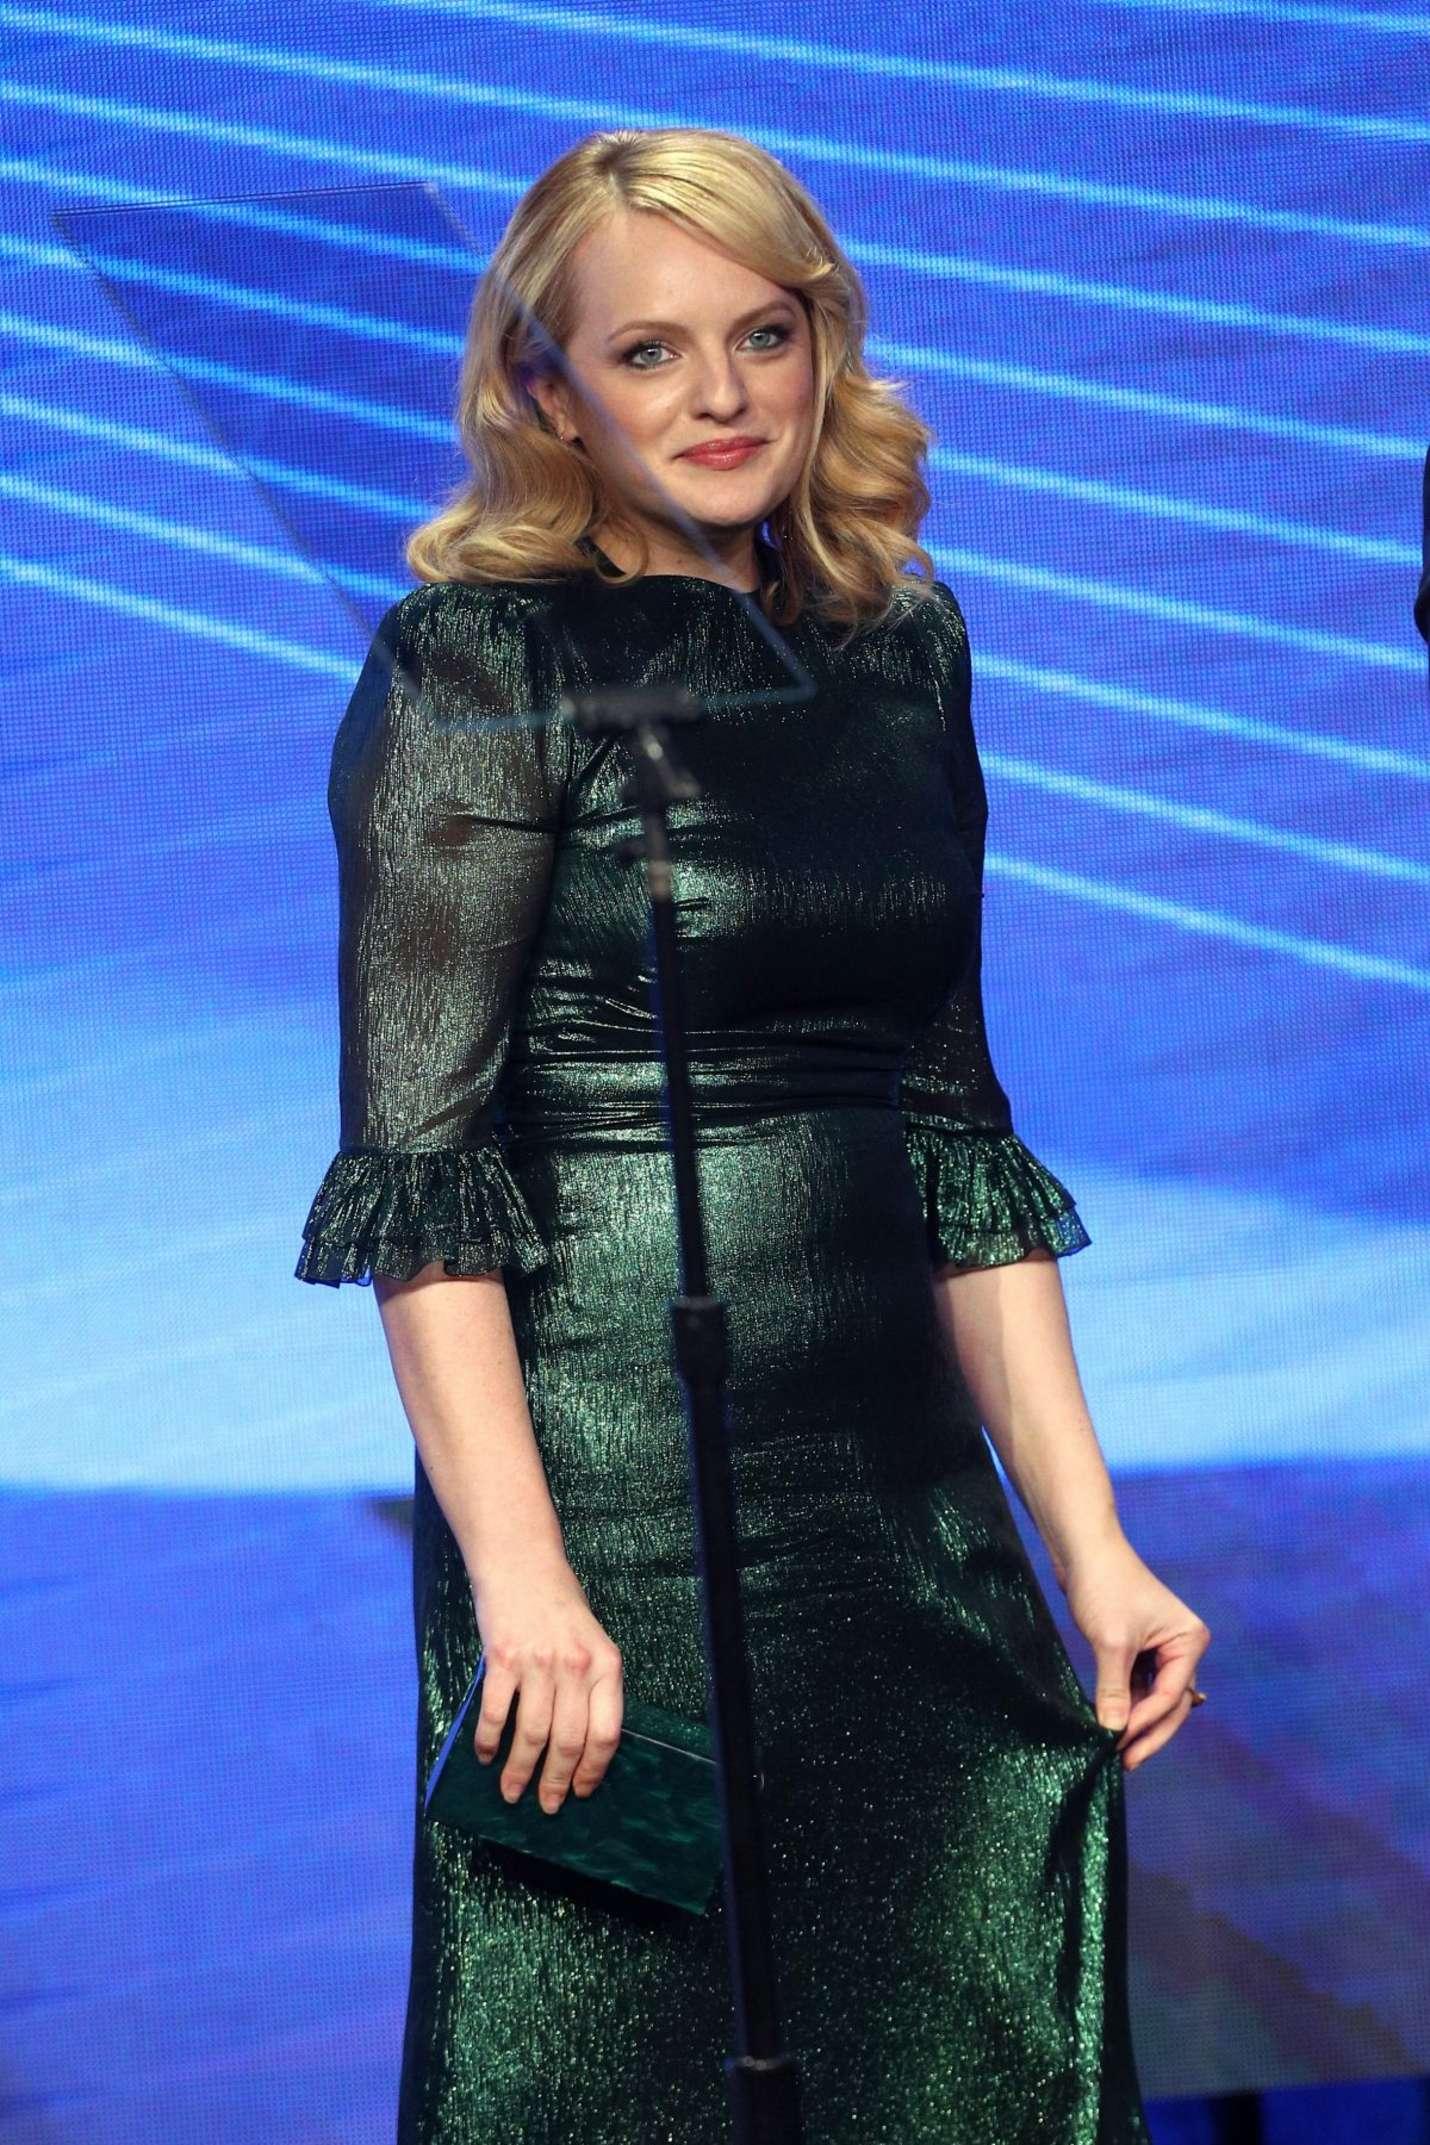 Elisabeth moss tca awards at the tca summer press tour in la nude (53 images)